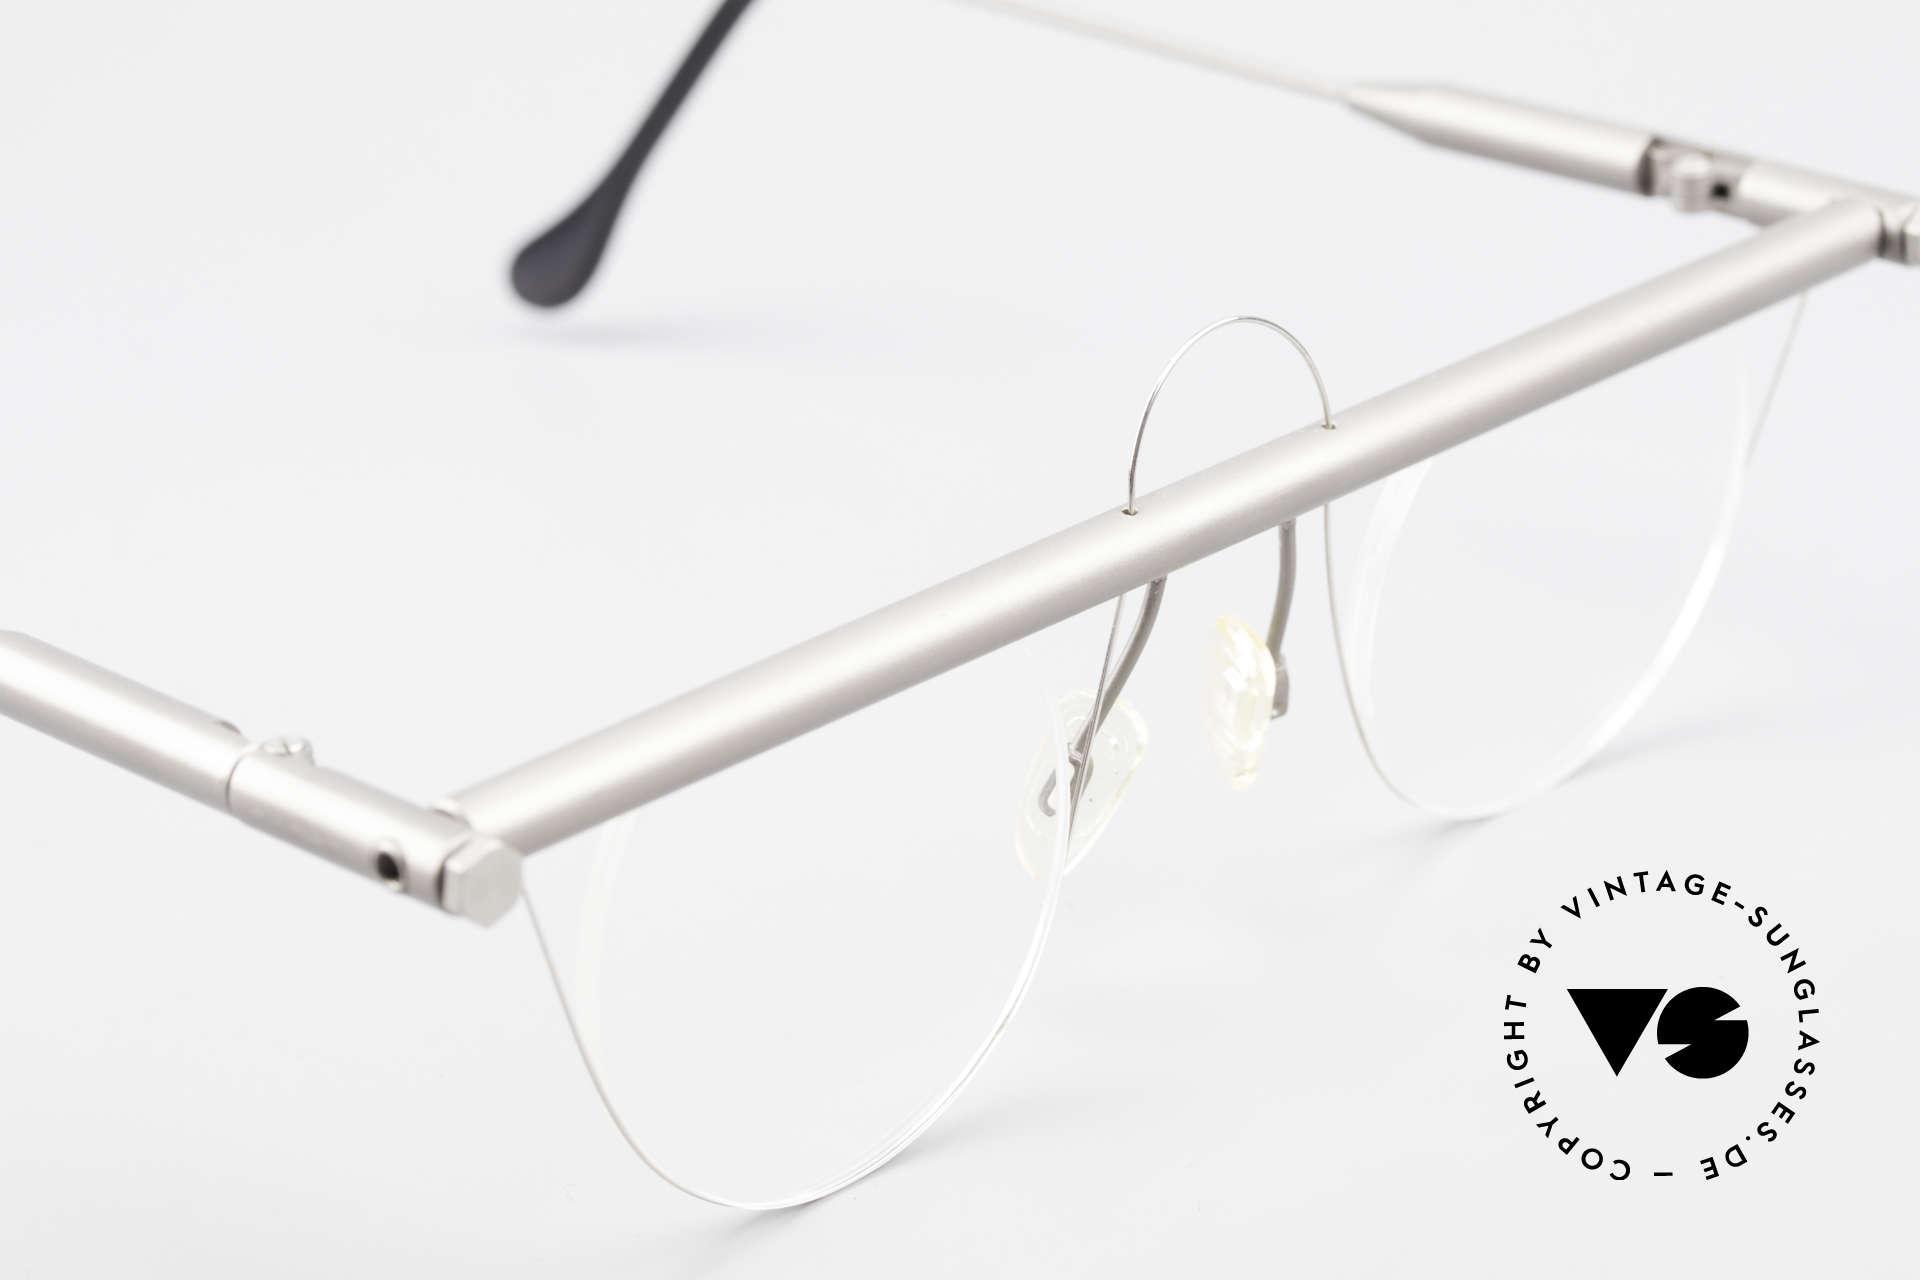 Bauhaus Rohrbrille Bauhaus Glasses Marcel Breuer, spiritual / intellectual frame design for individualists, Made for Men and Women